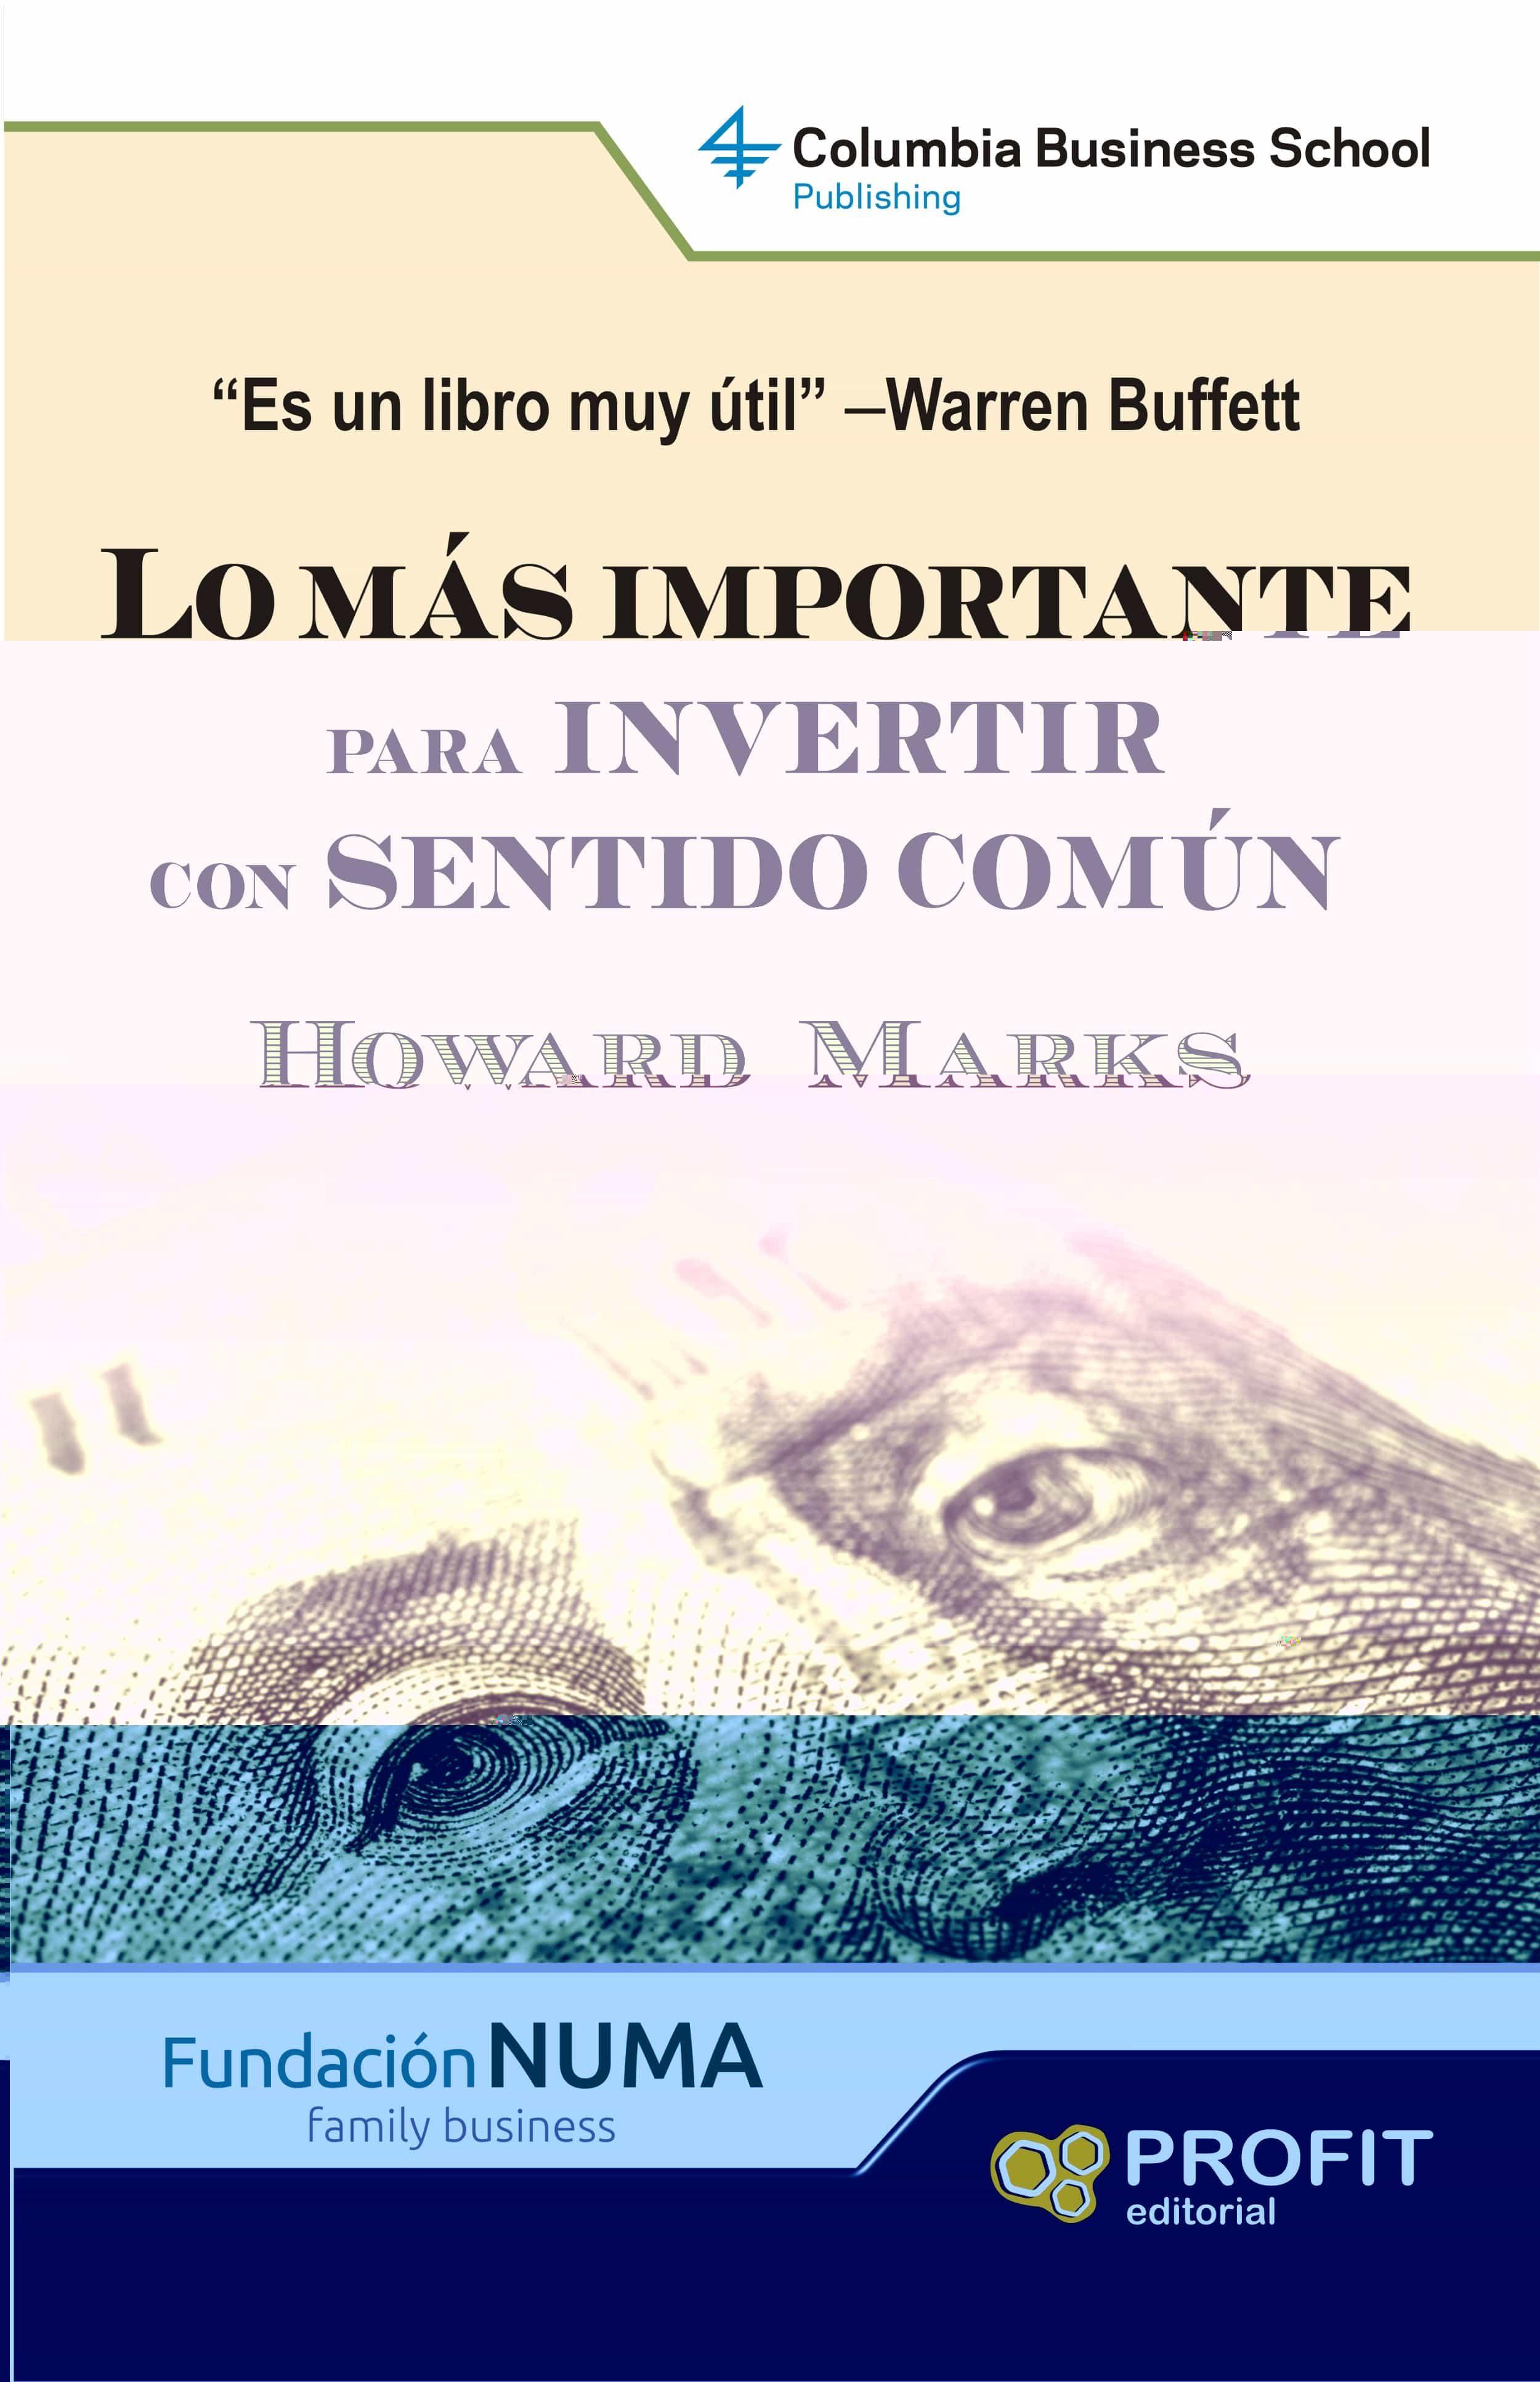 lo mas importante para invertir con sentido comun-howard marks-9788415505860